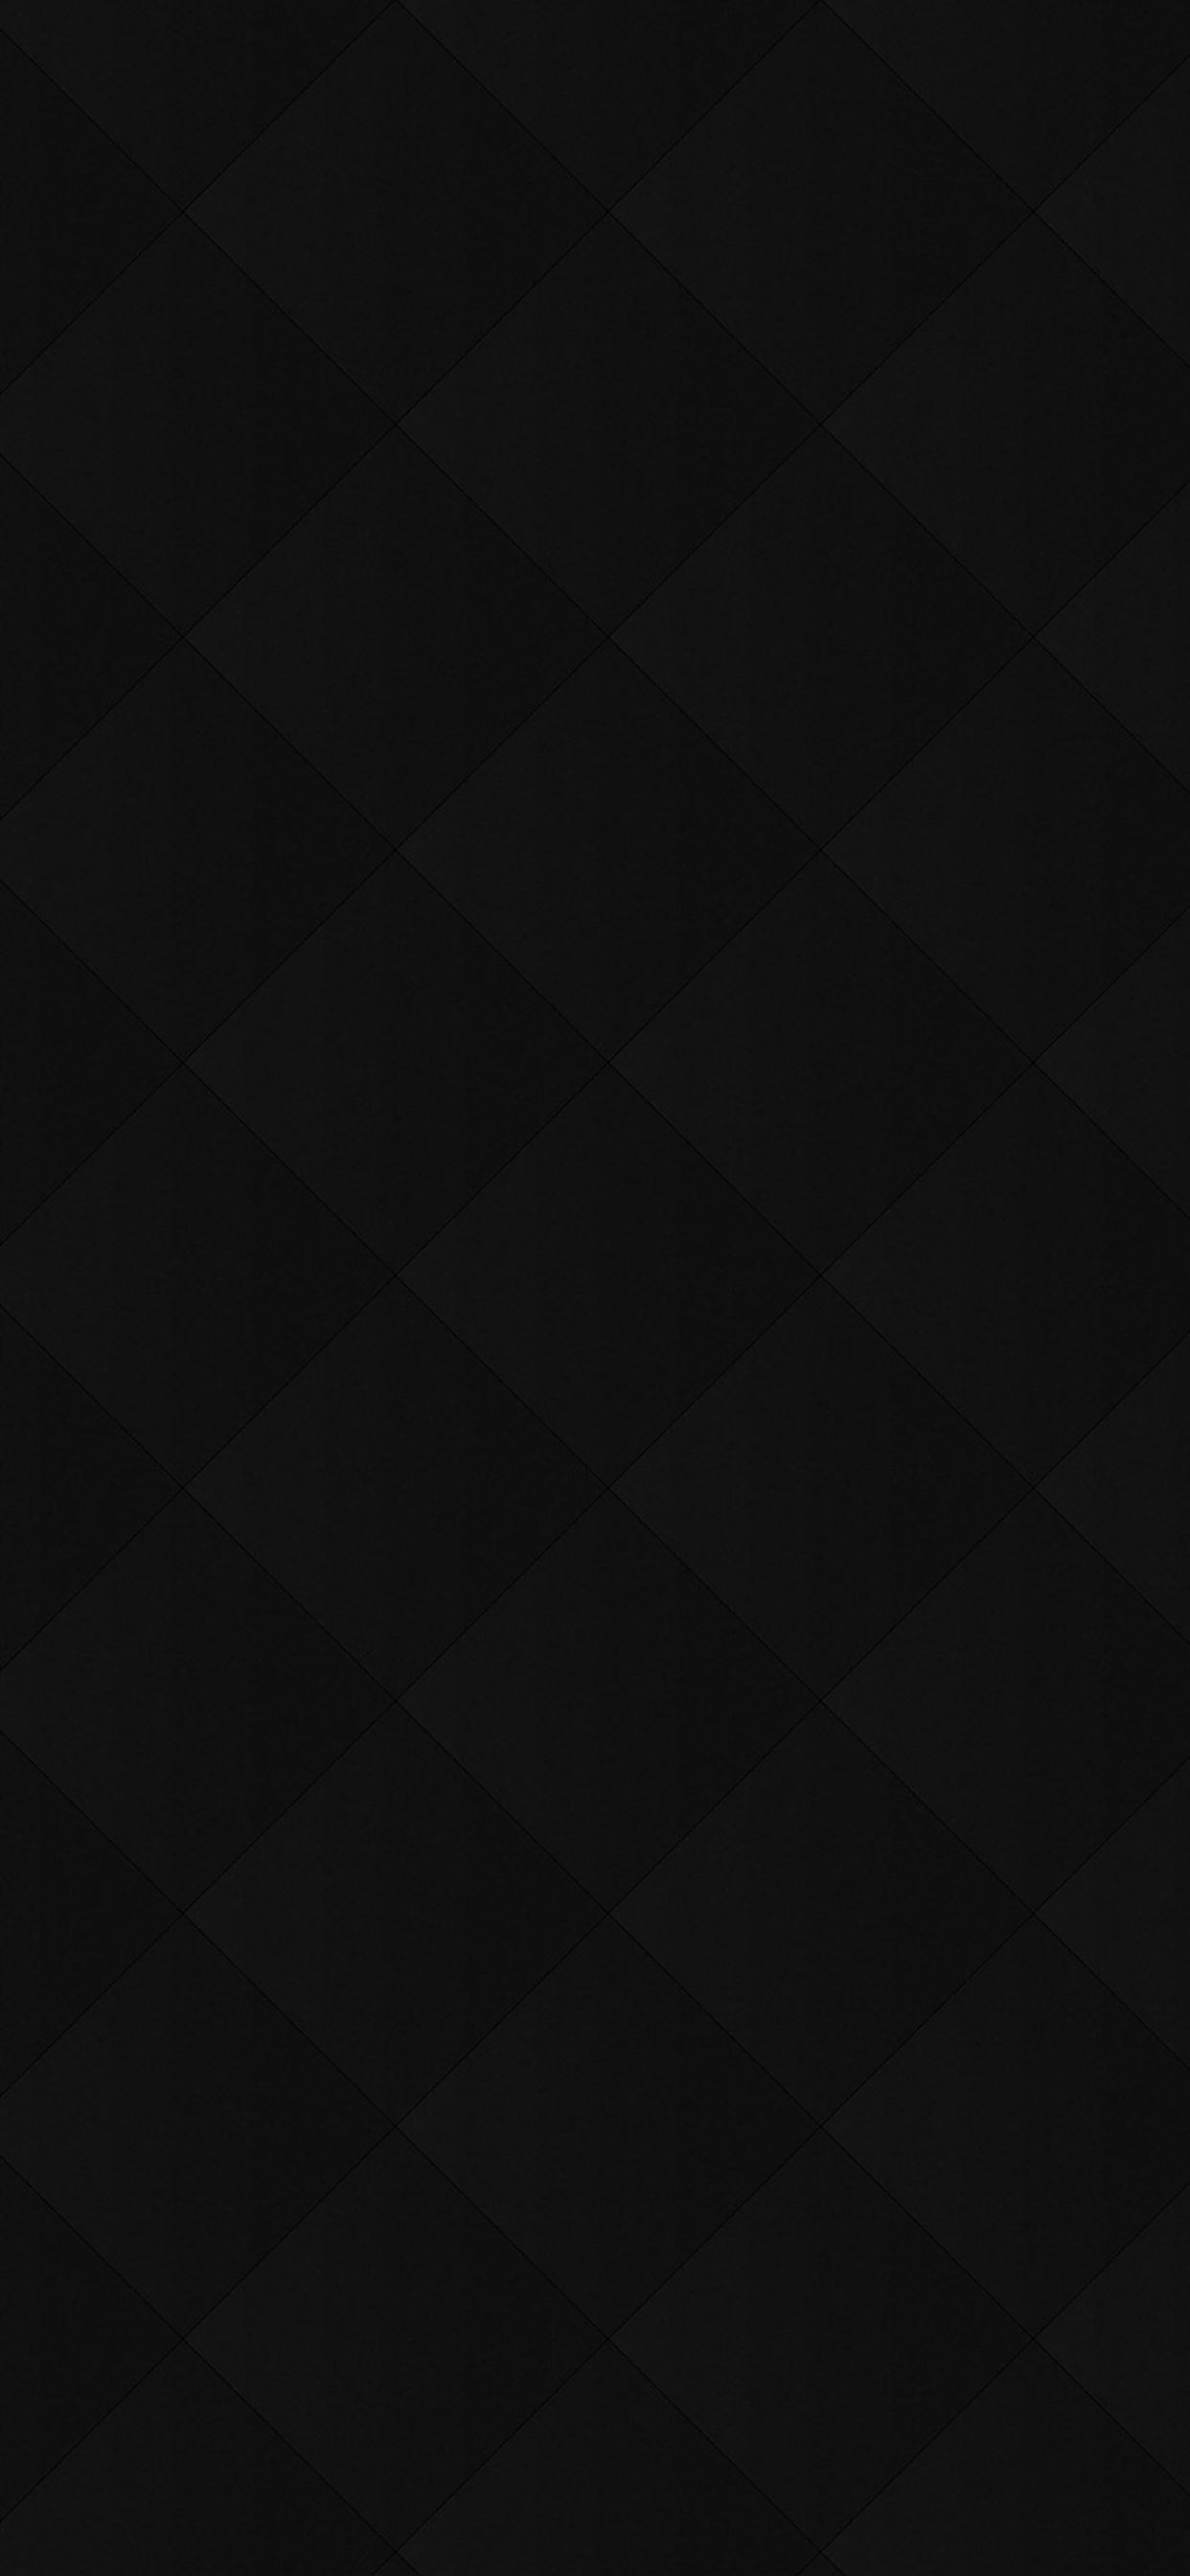 Gradient Squares Dark Pattern Iphone X Wallpapers Free Download